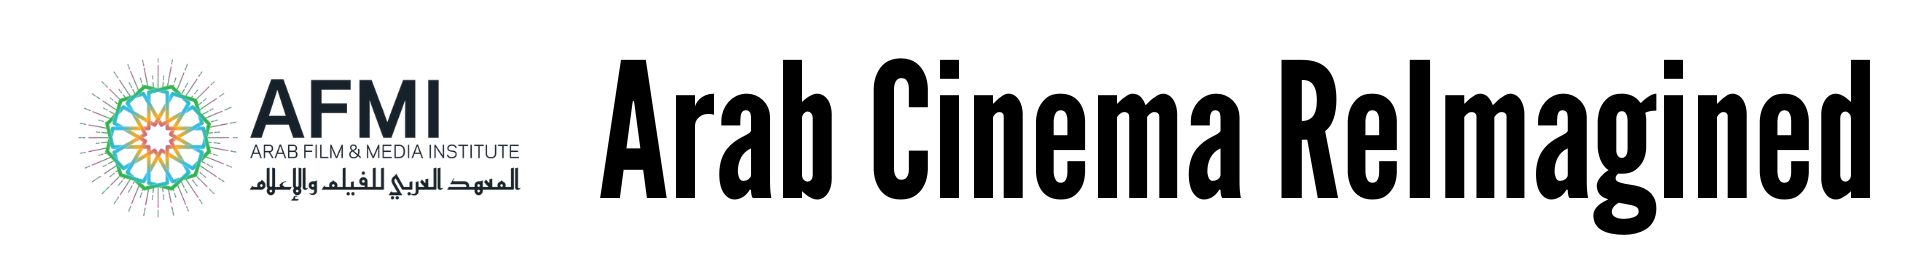 Arab Cinema ReImagined